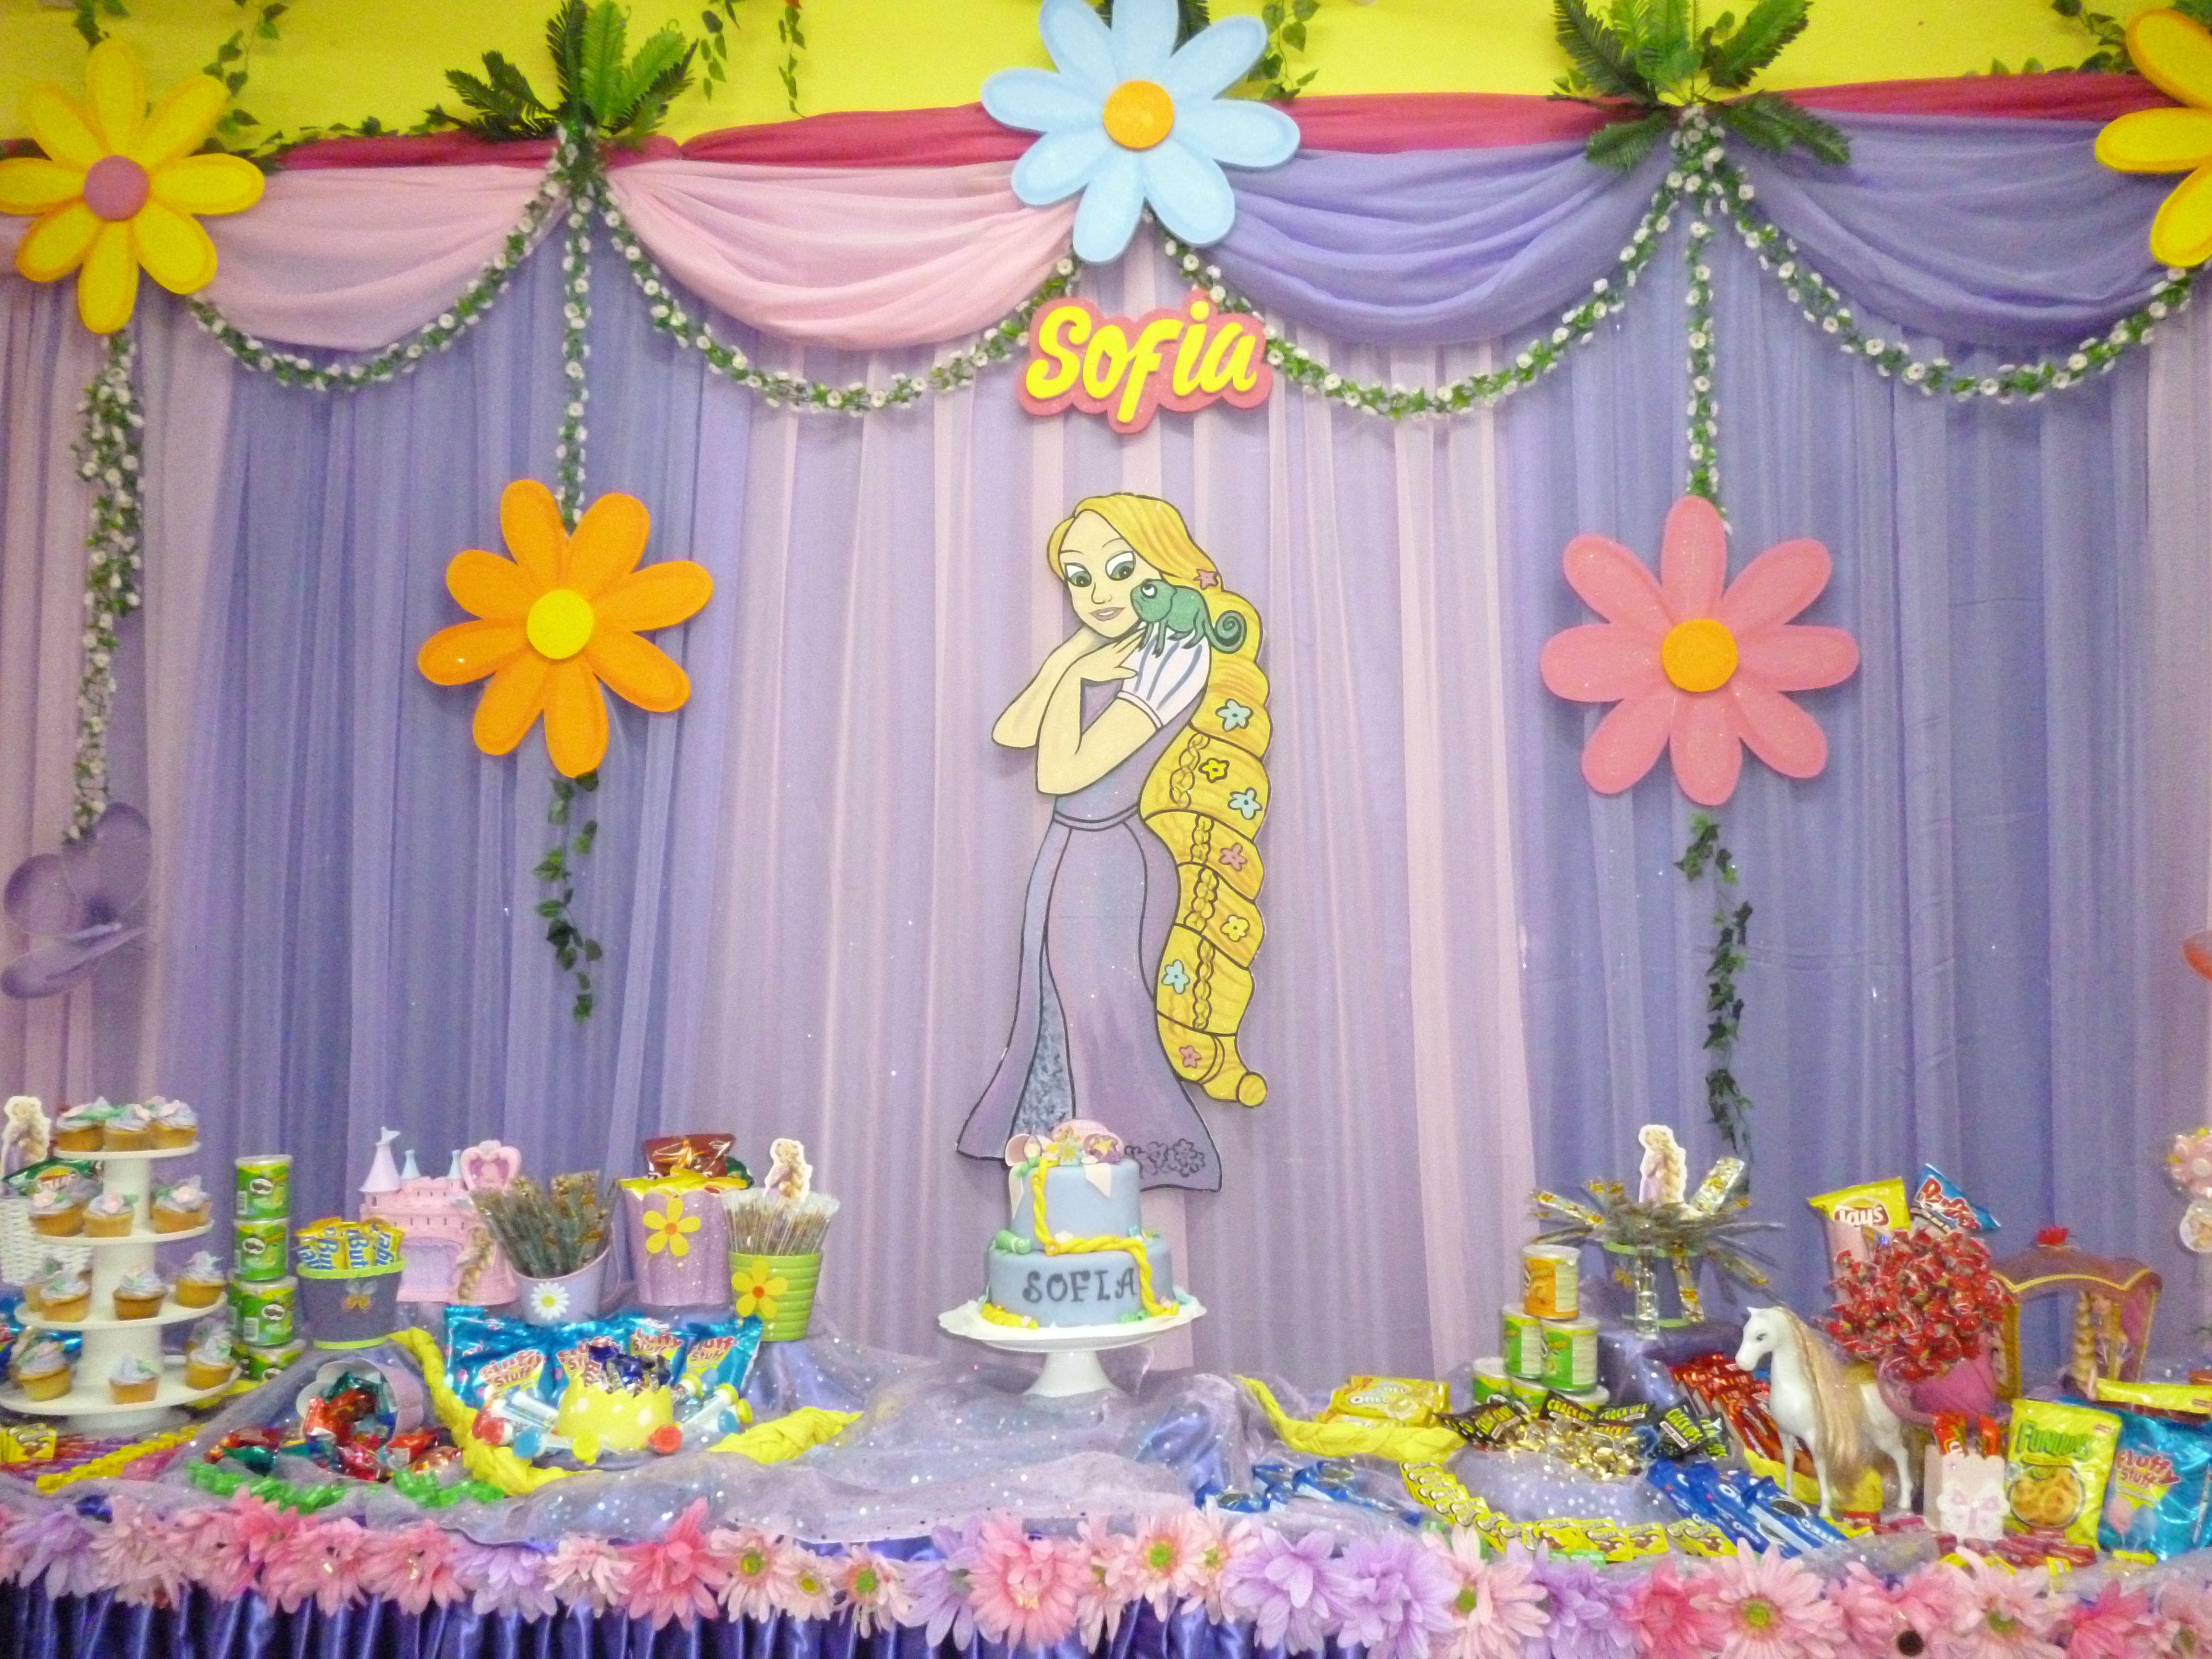 Decoraci n para cumplea os birthday decor ideas - Decoraciones de cumpleanos ...